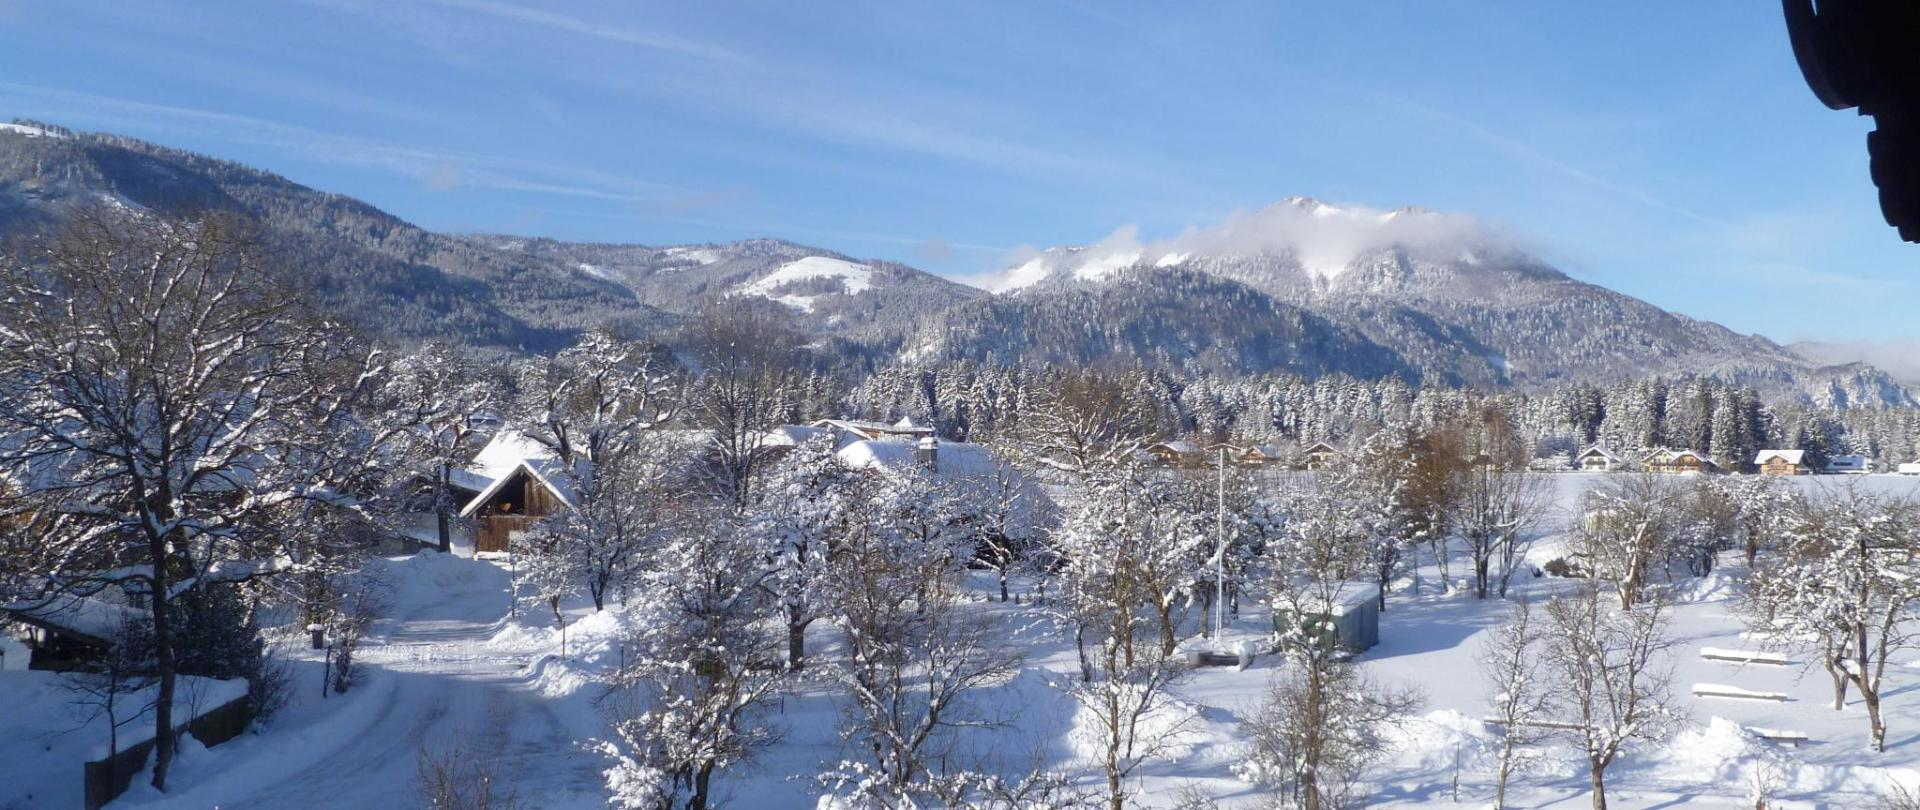 Winter Ausblick Fewo 4 - 2.JPG